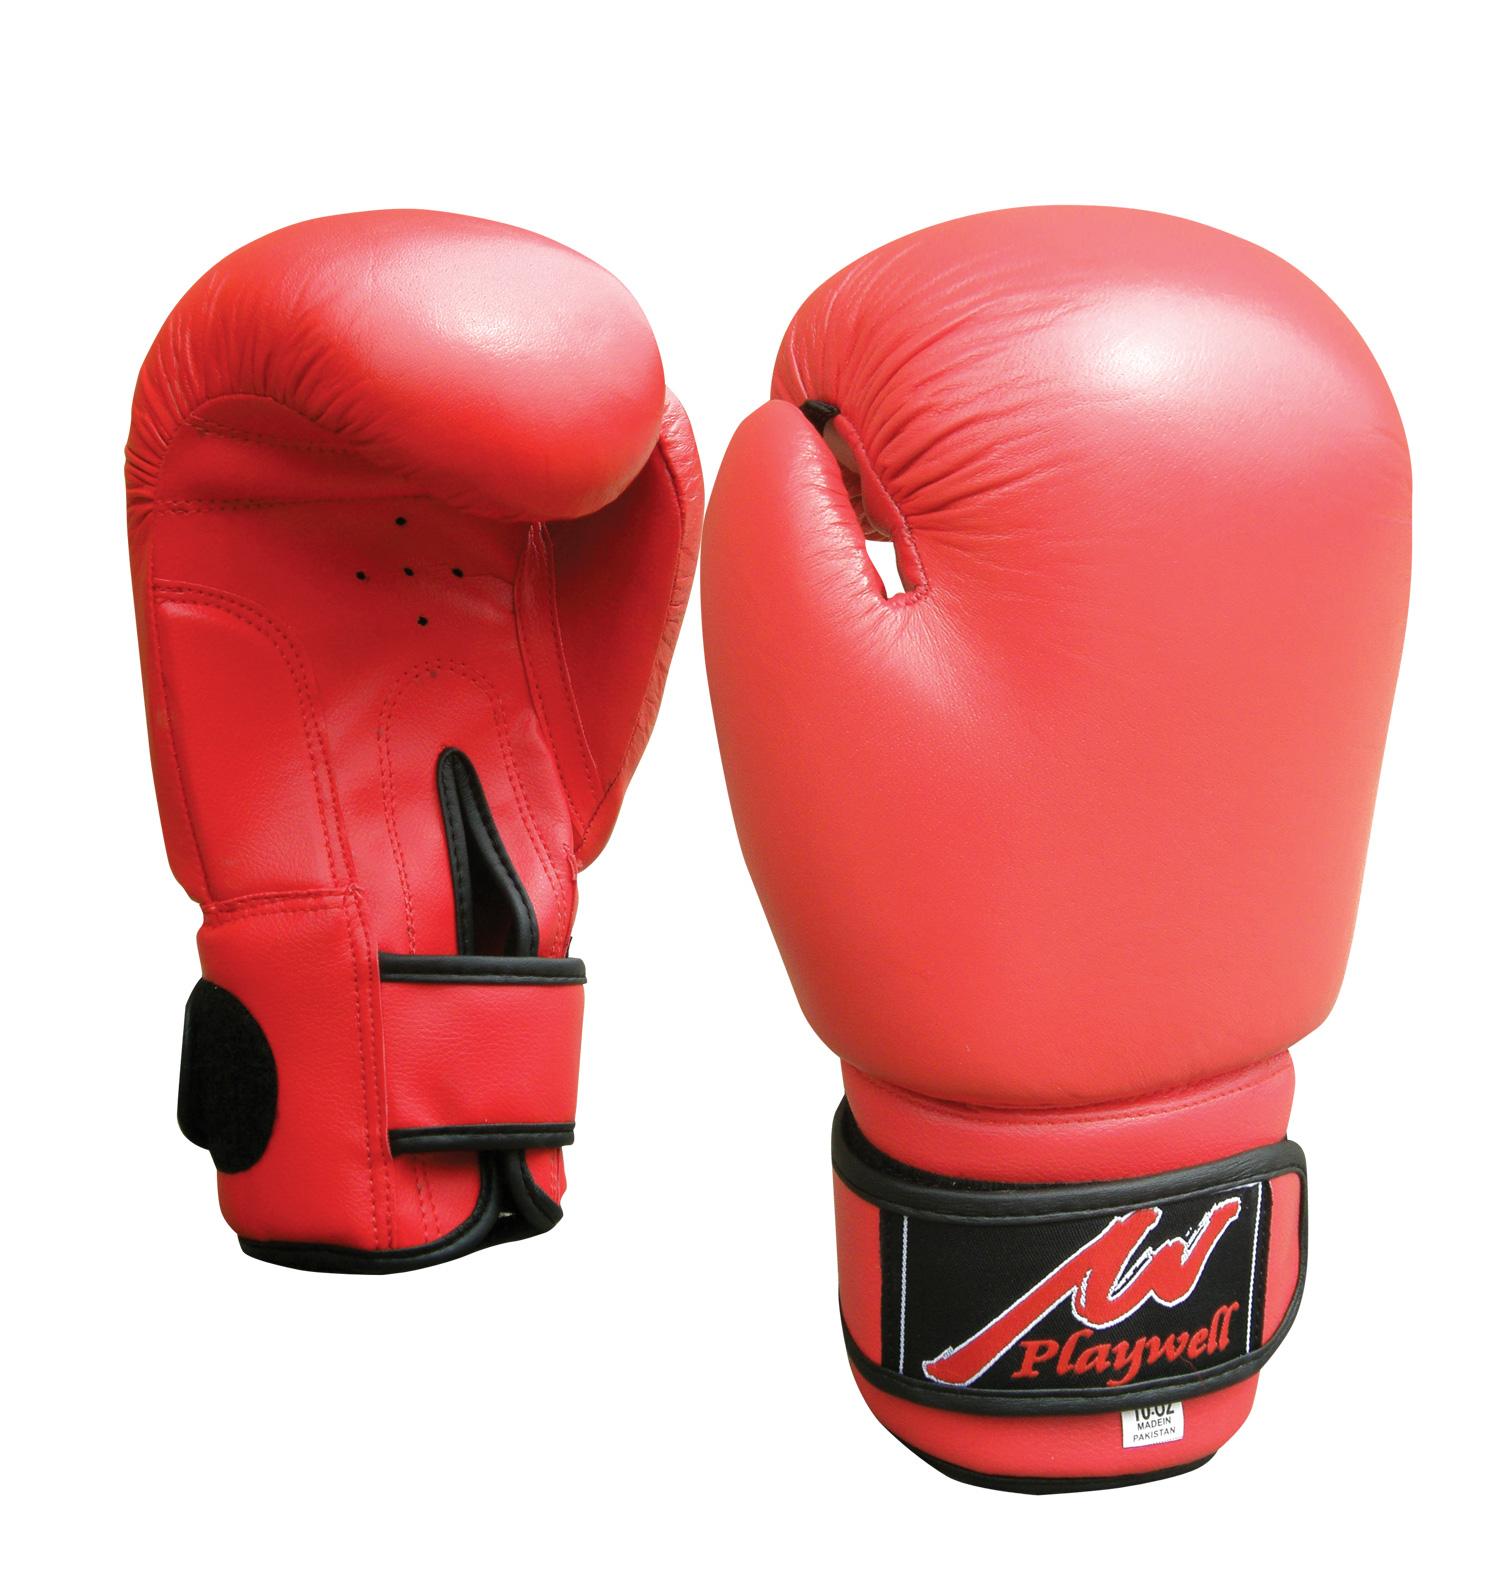 boxing-gear-san-francisco.jpg